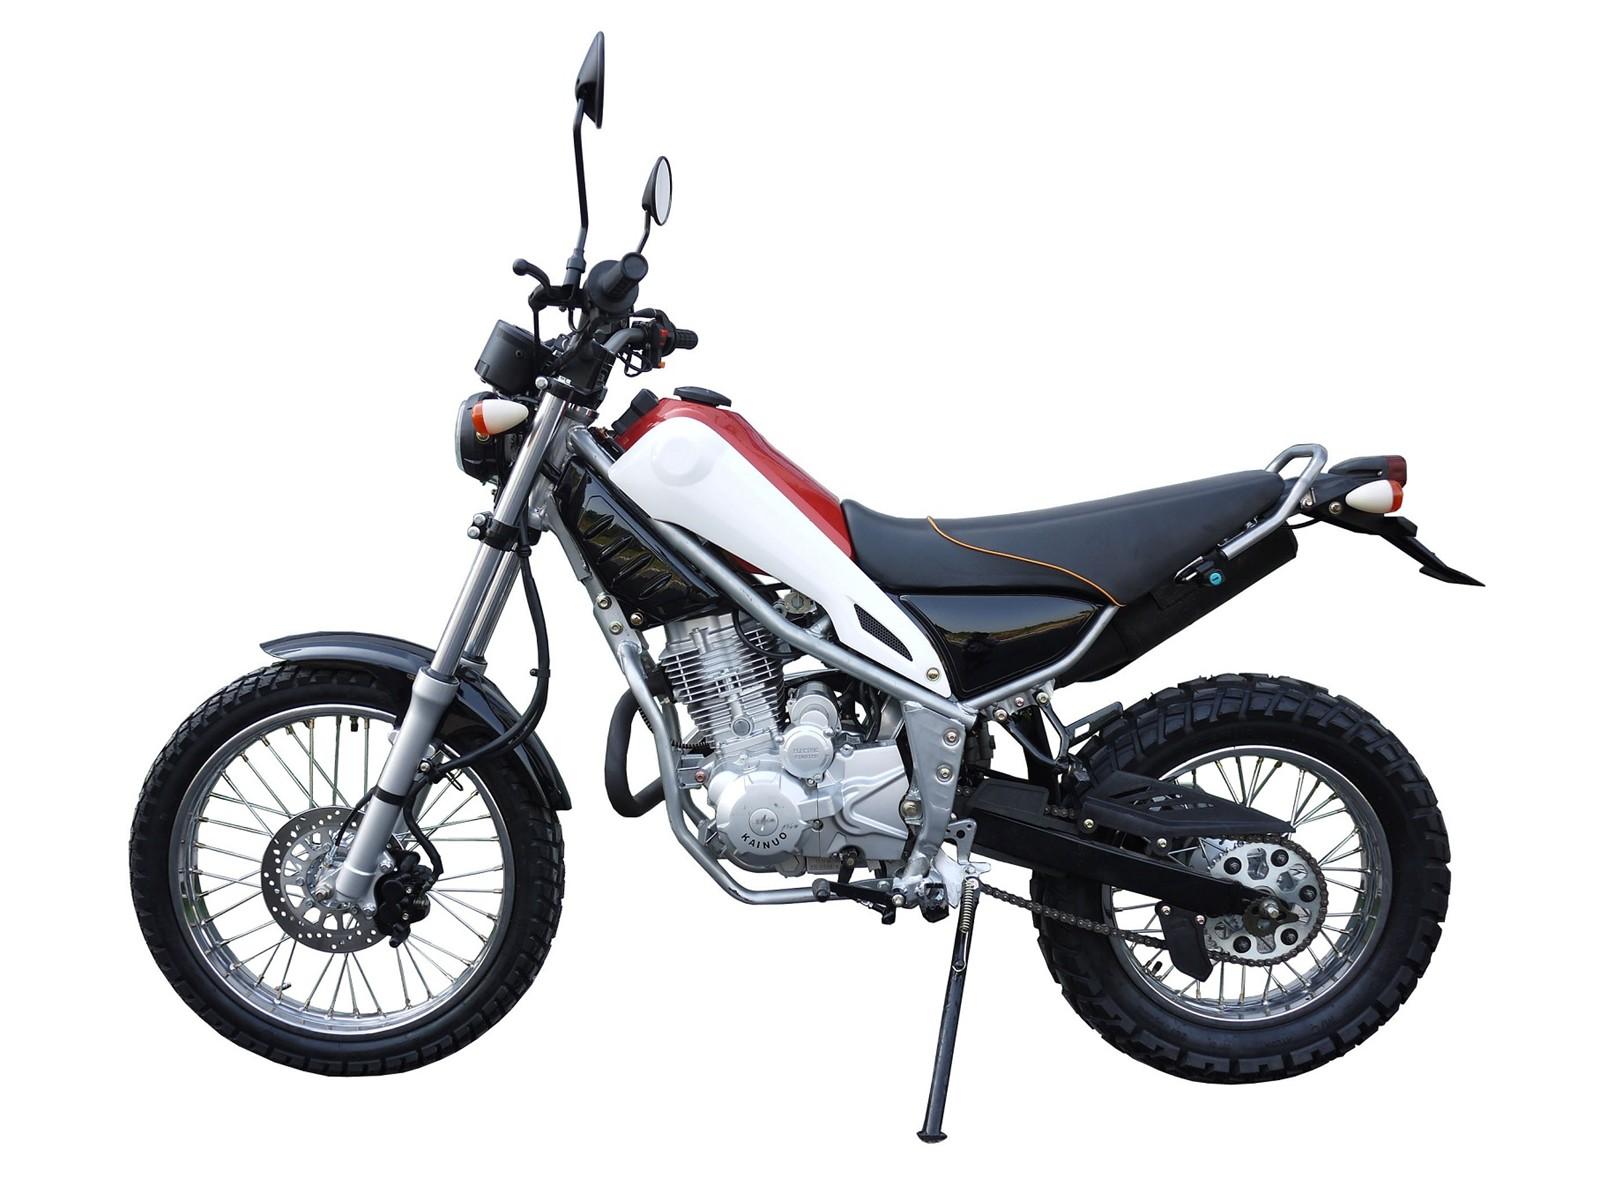 samilar japanese motorcycle 150cc dirt bike cd150 mg purchasing souring agent. Black Bedroom Furniture Sets. Home Design Ideas